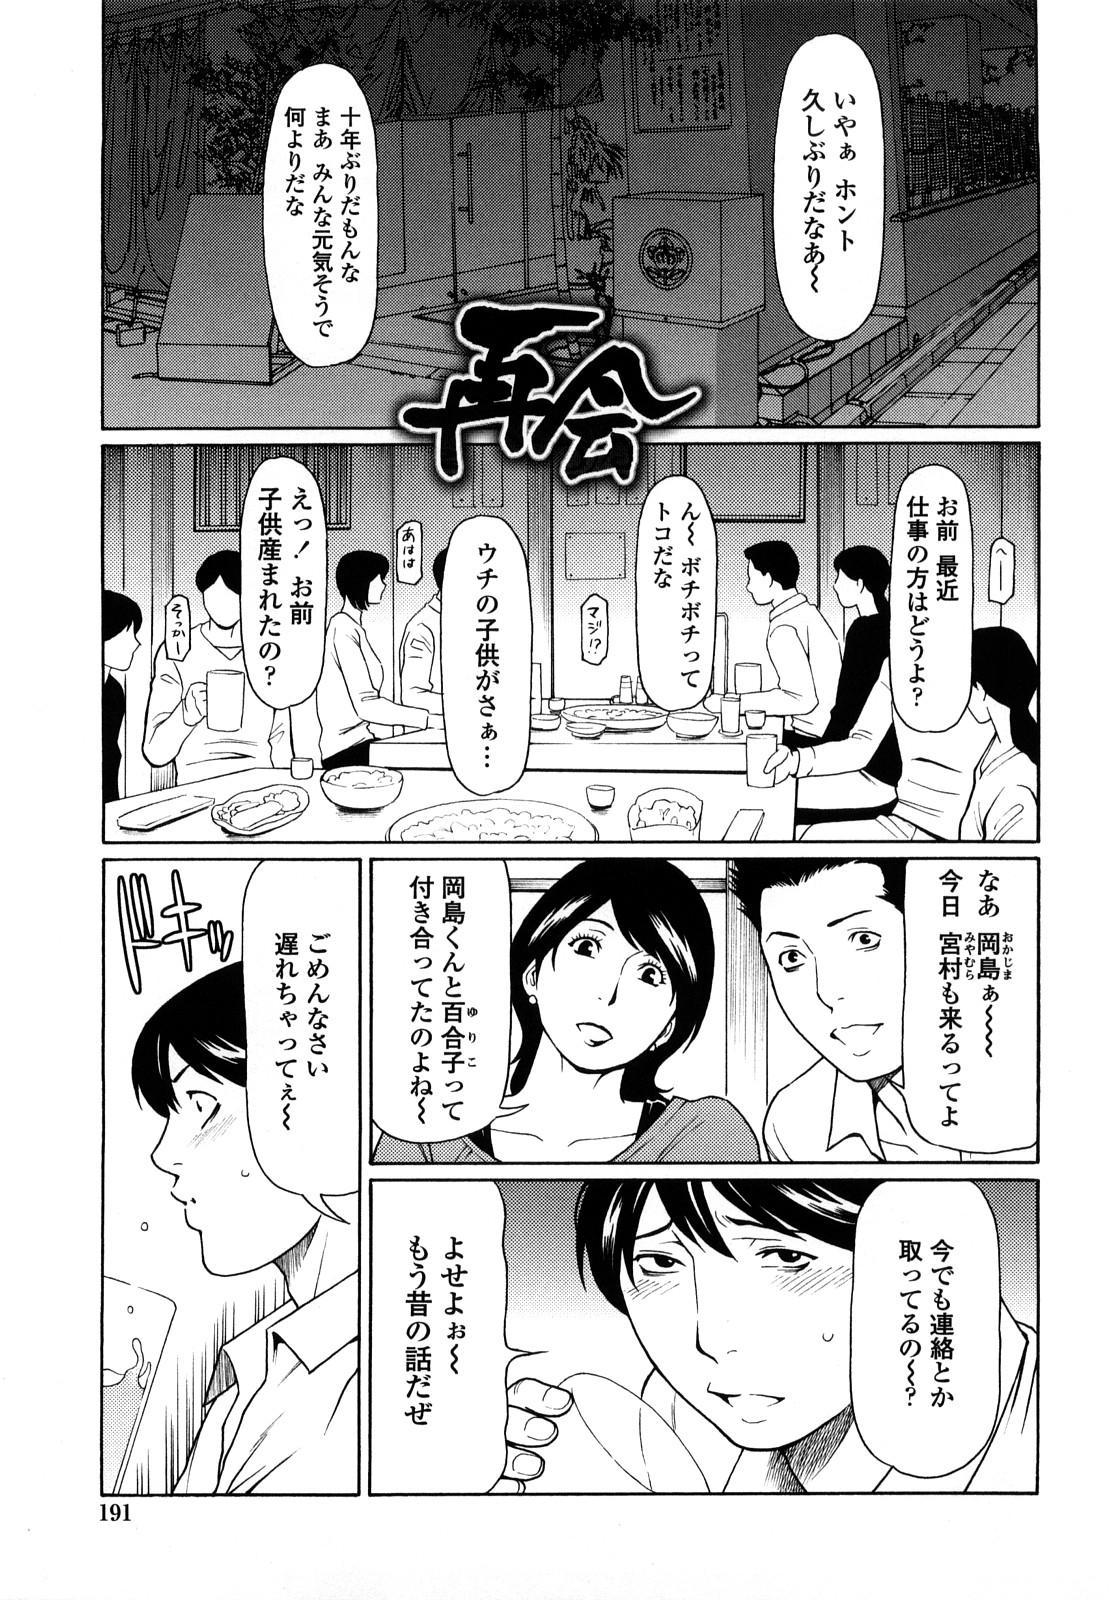 [Takasugi Kou] Kindan no Haha-Ana - Immorality Love-Hole [Decensored] 192